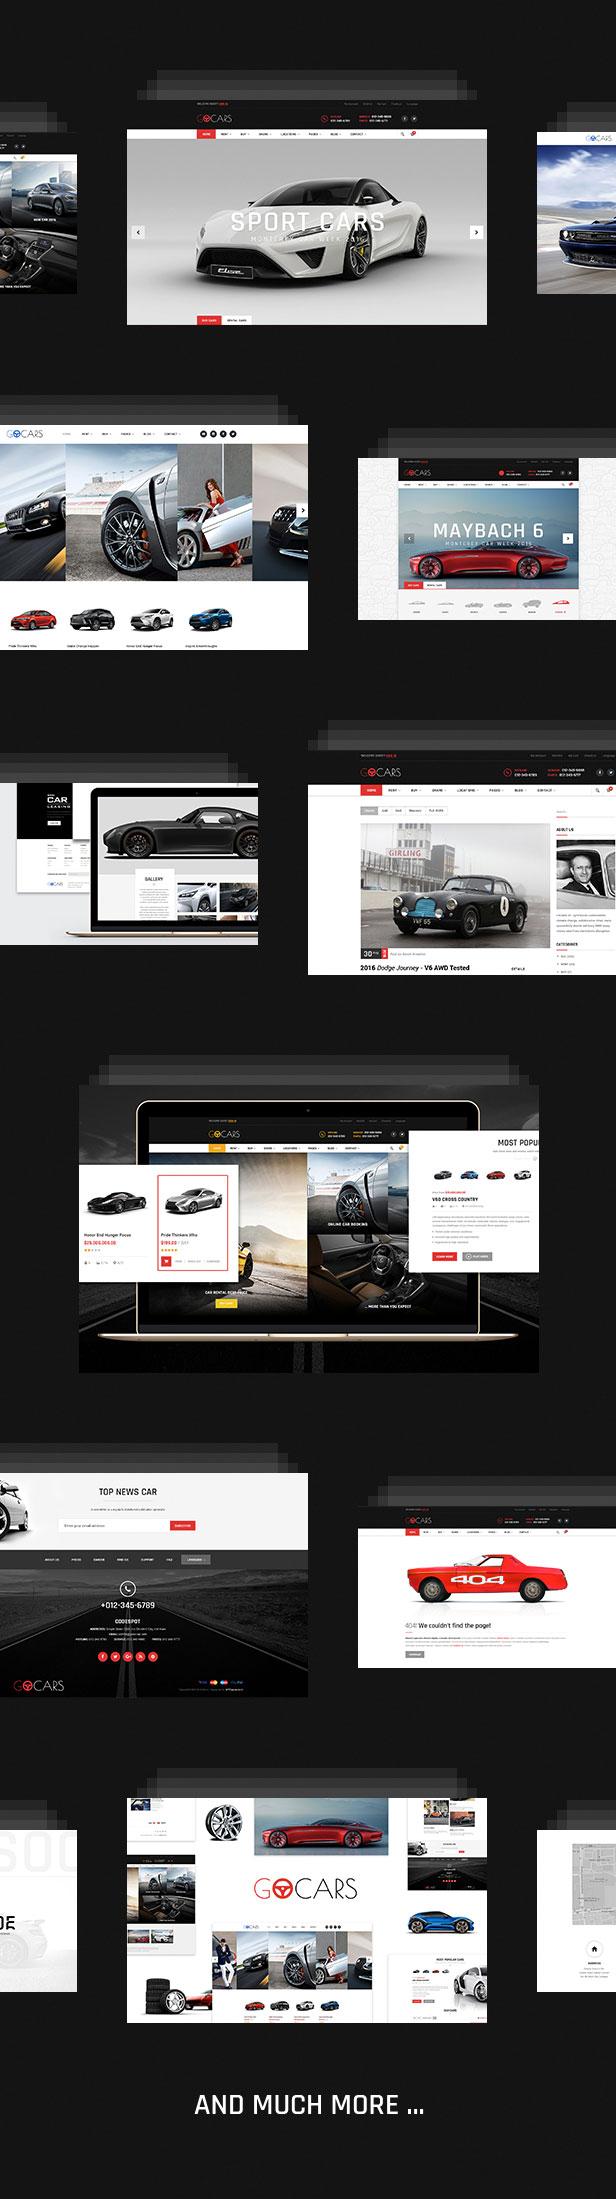 Modern design for cars market